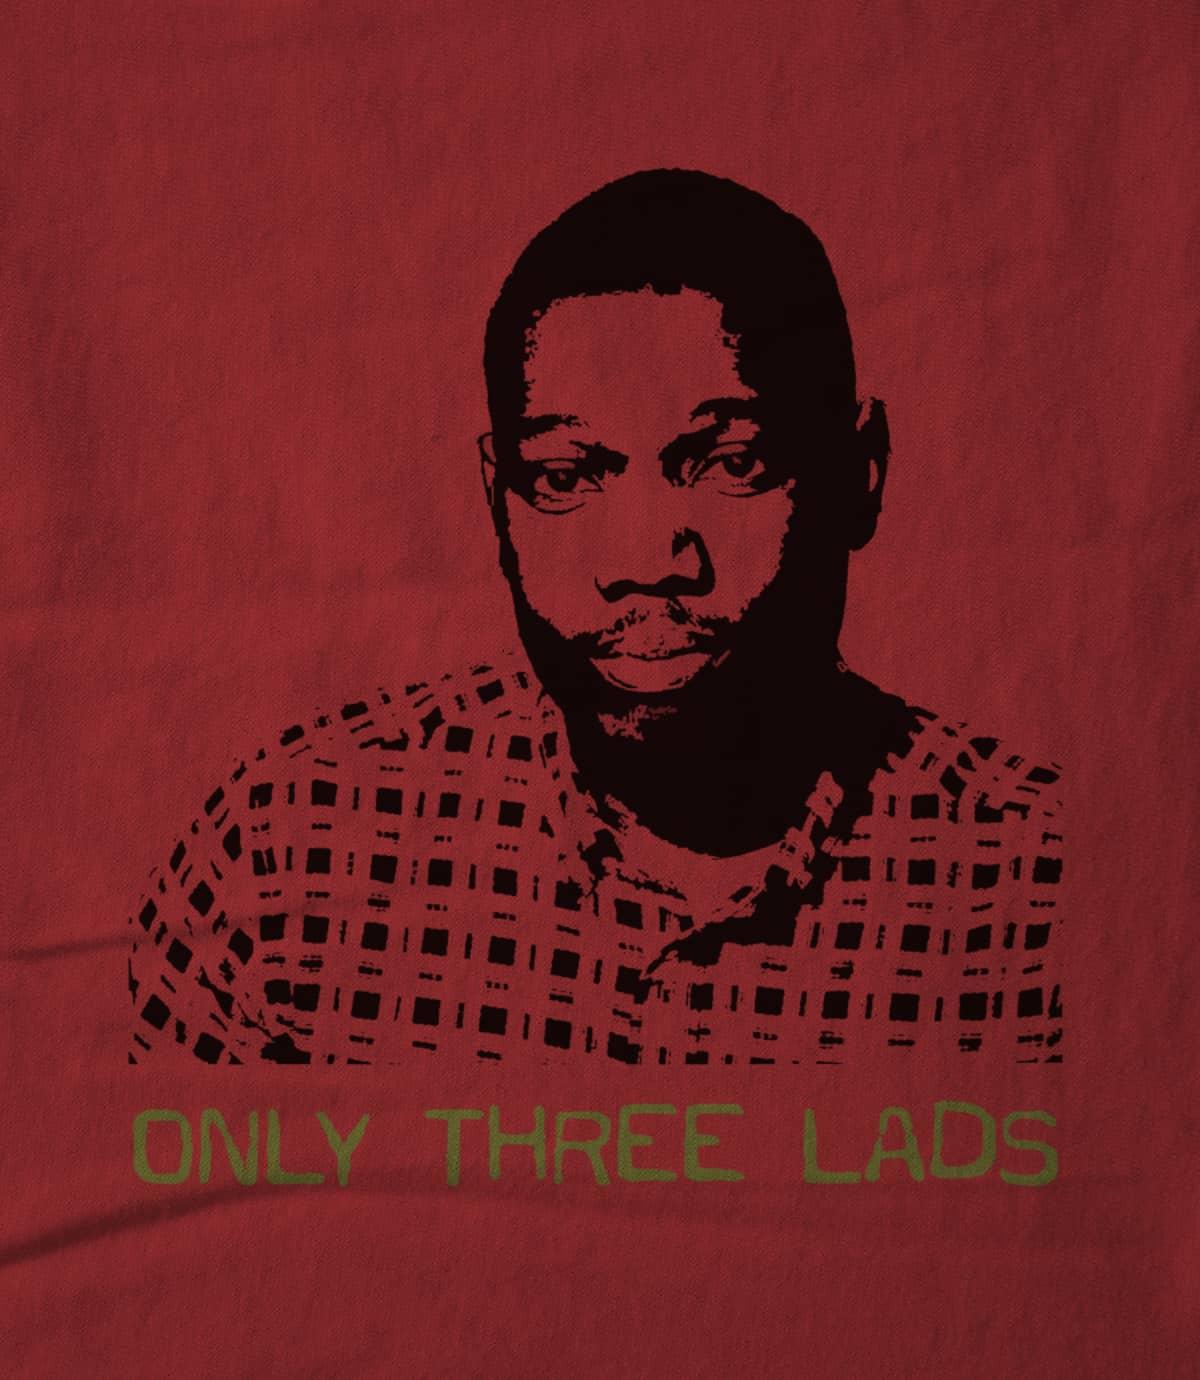 Only three lads revolution  1629767469